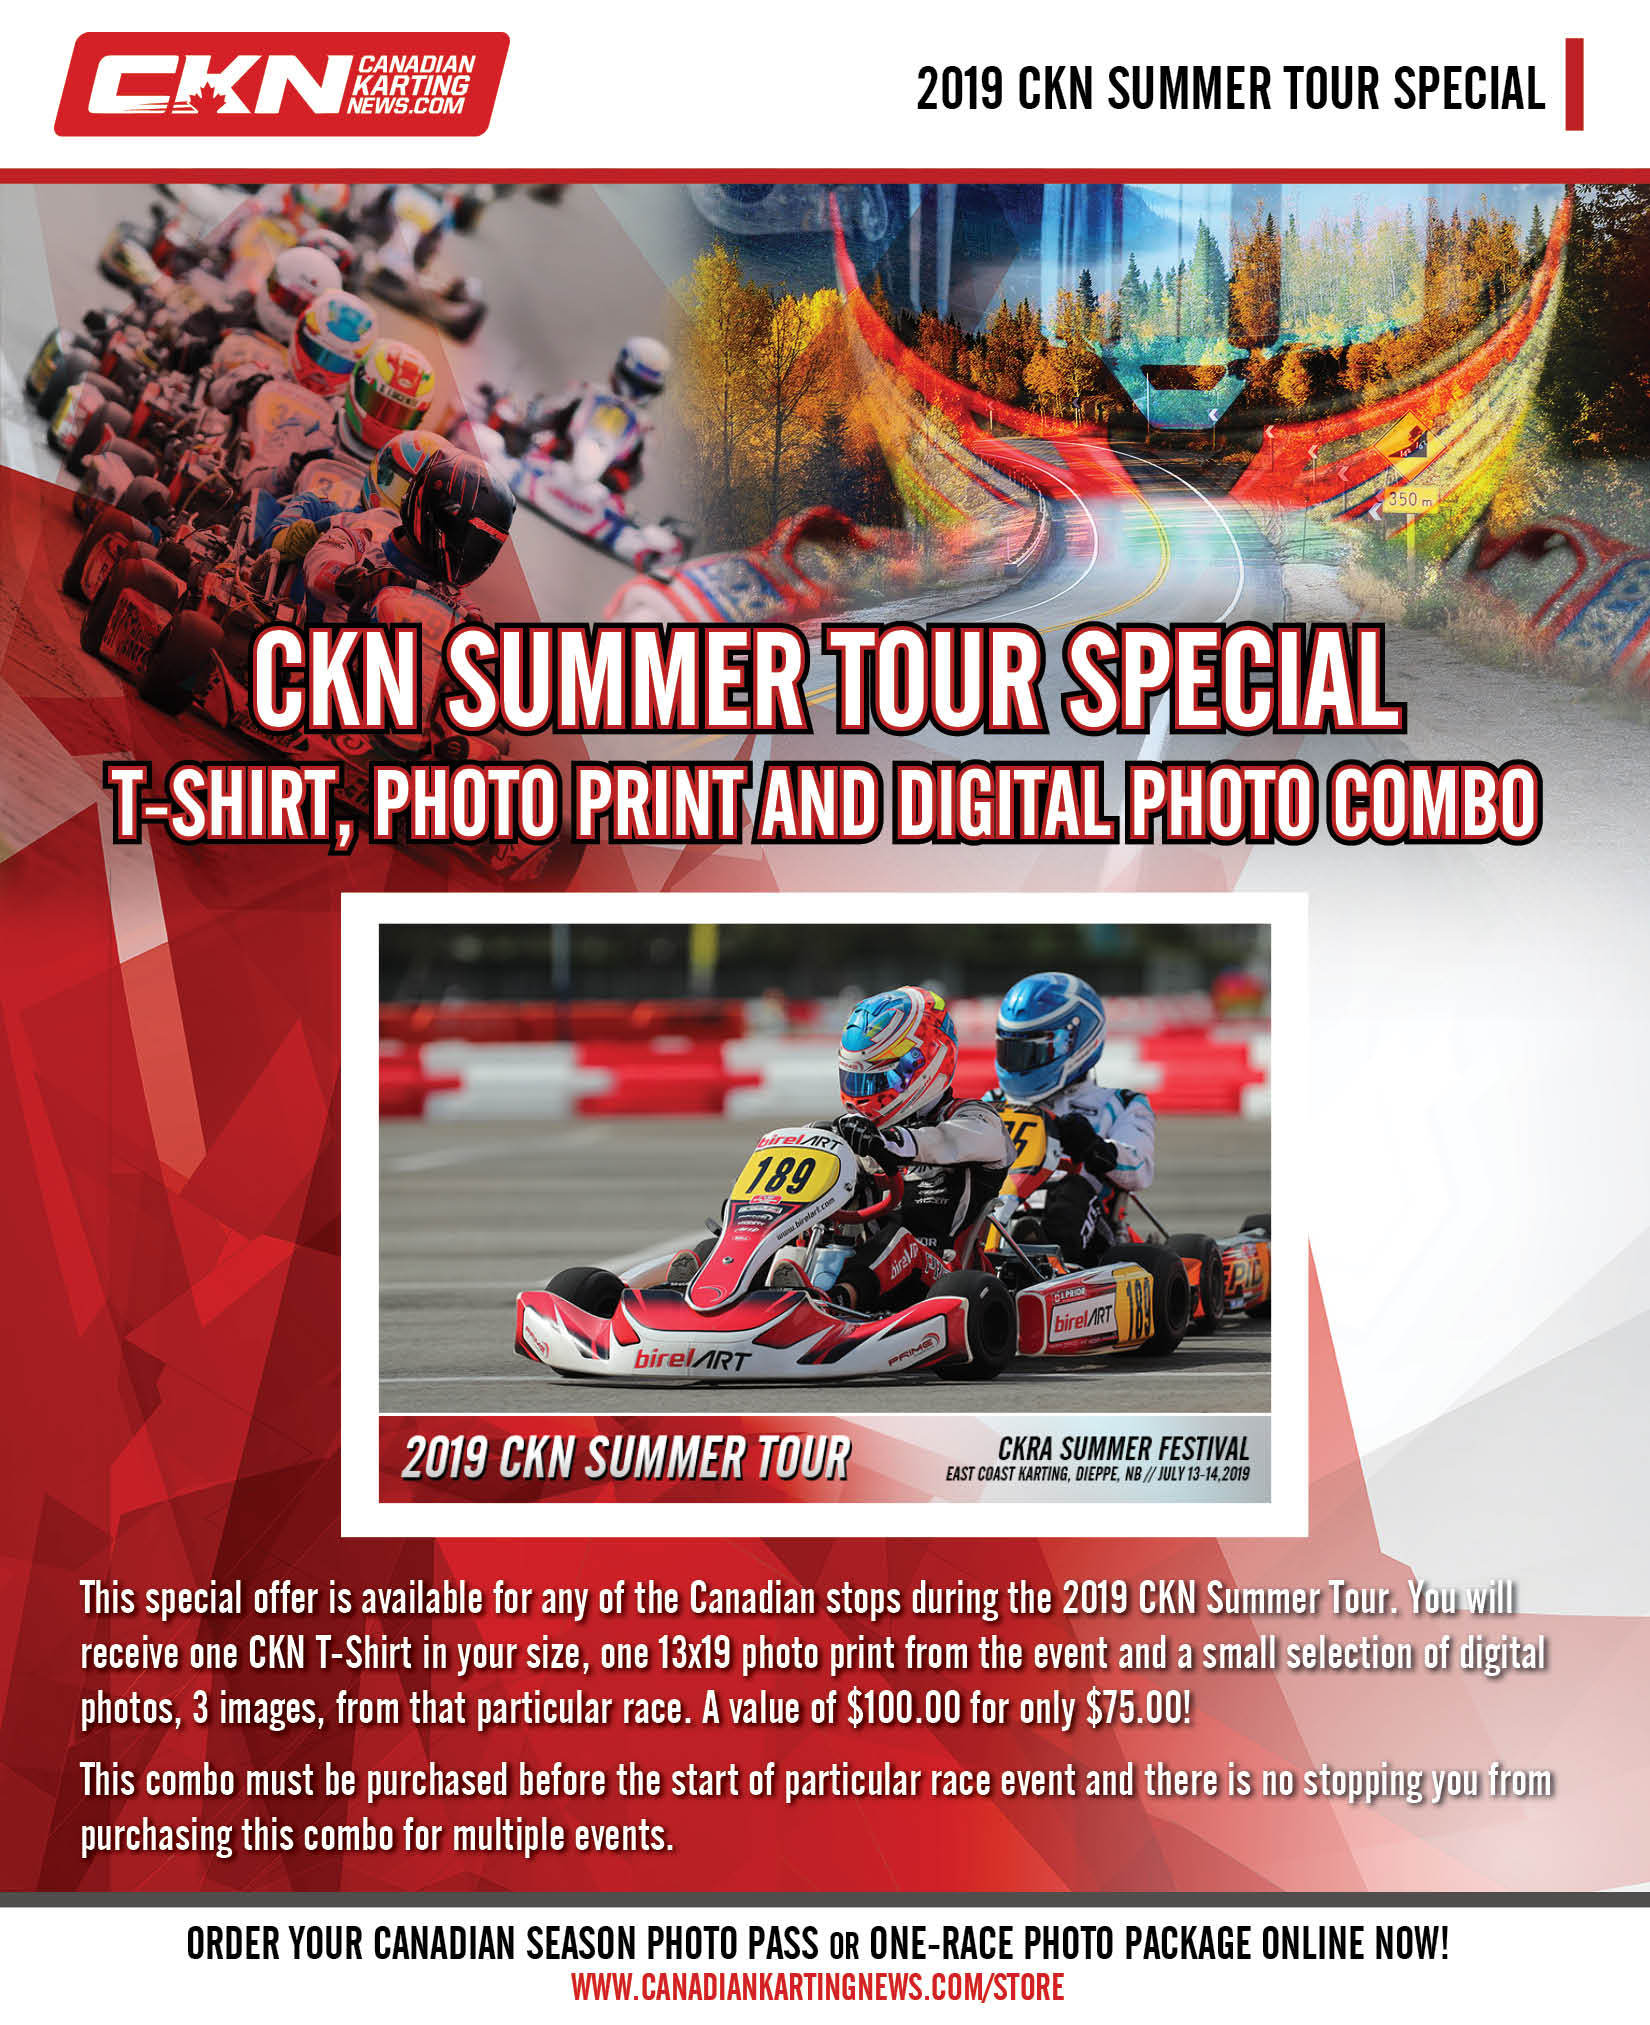 CKN Summer Tour Special - T-Shirt, Photo Print and Digital Photo Combo 00009